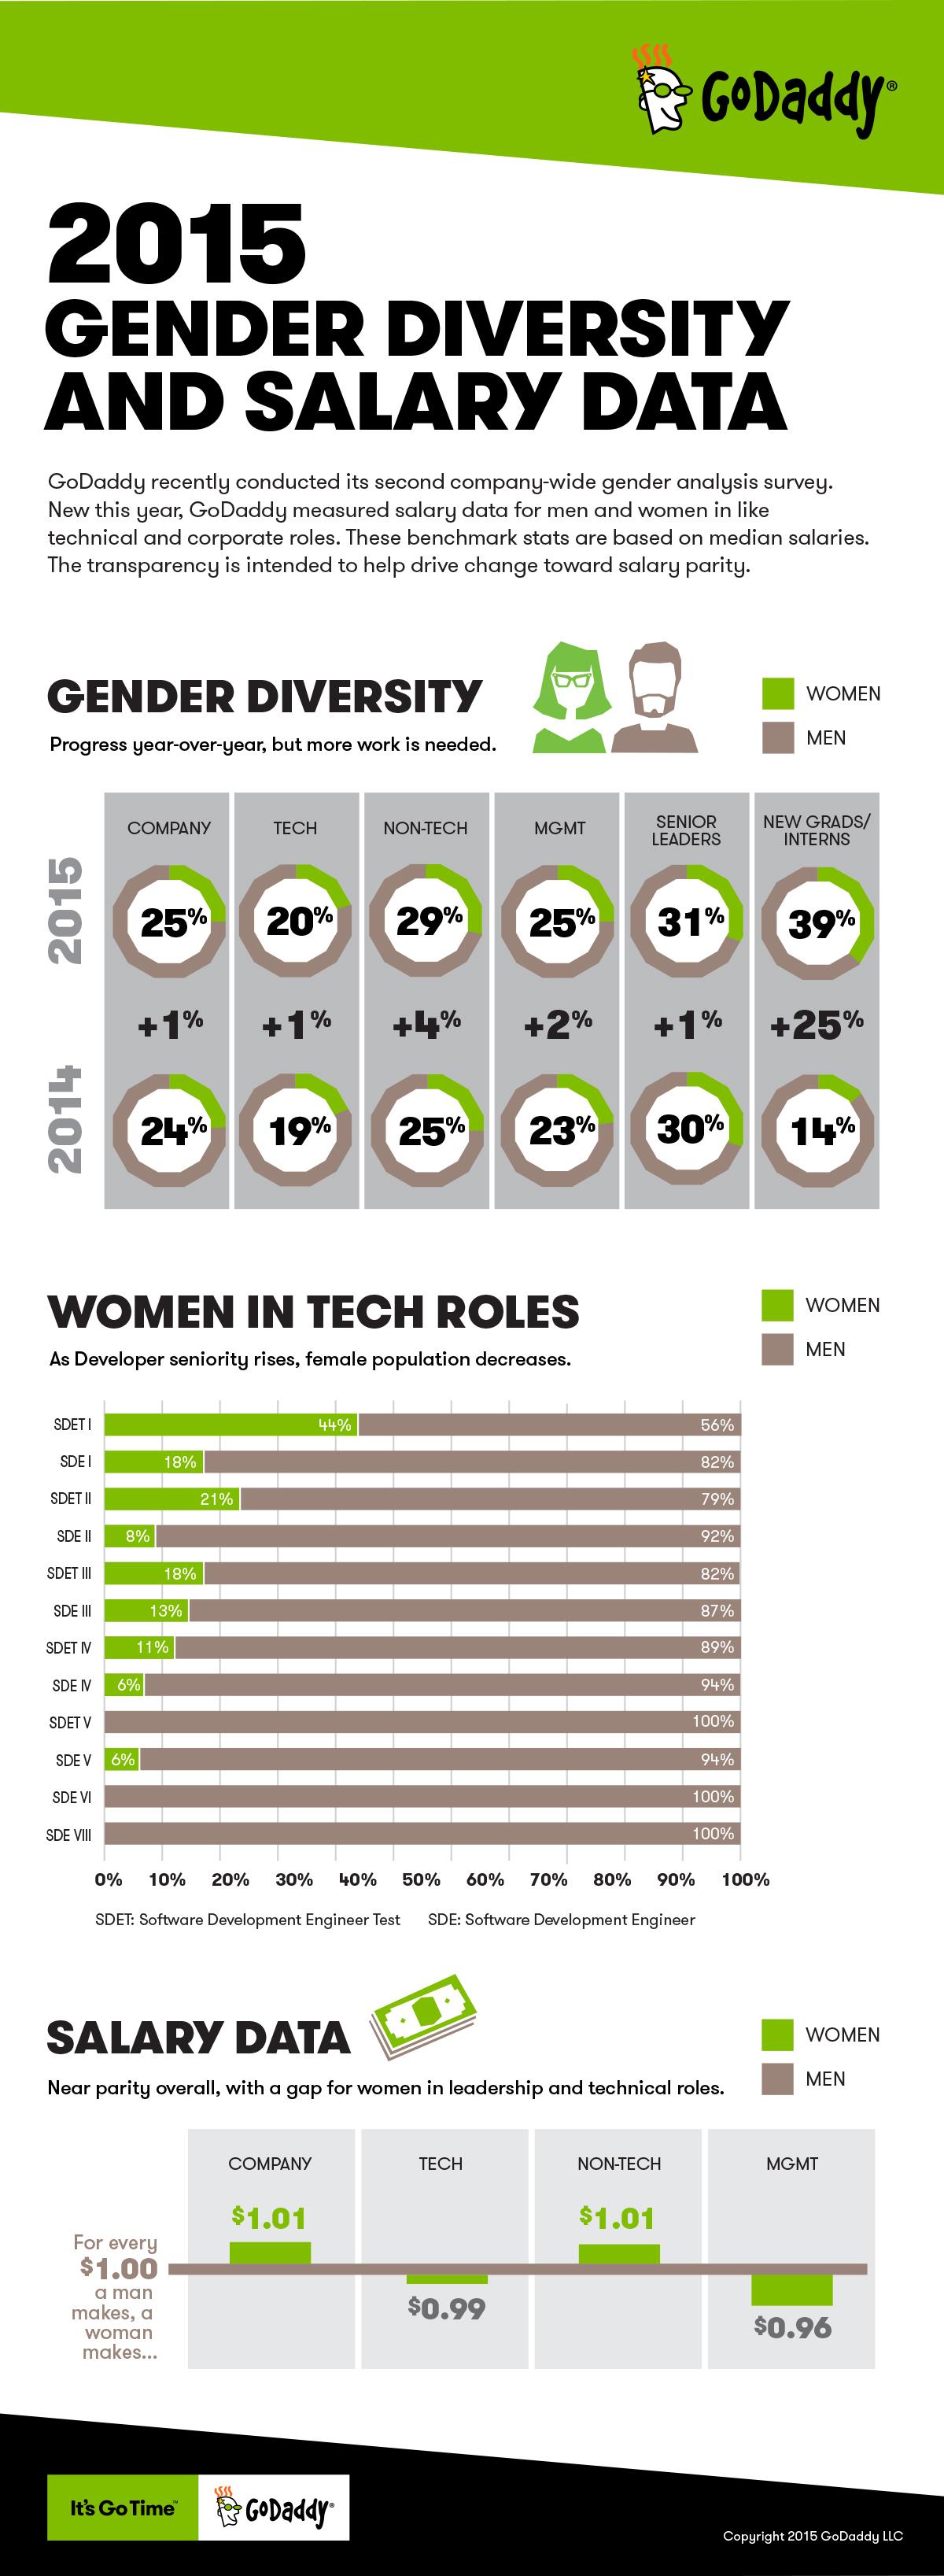 GoDaddy Compensation Parity 2015 Info Graphic